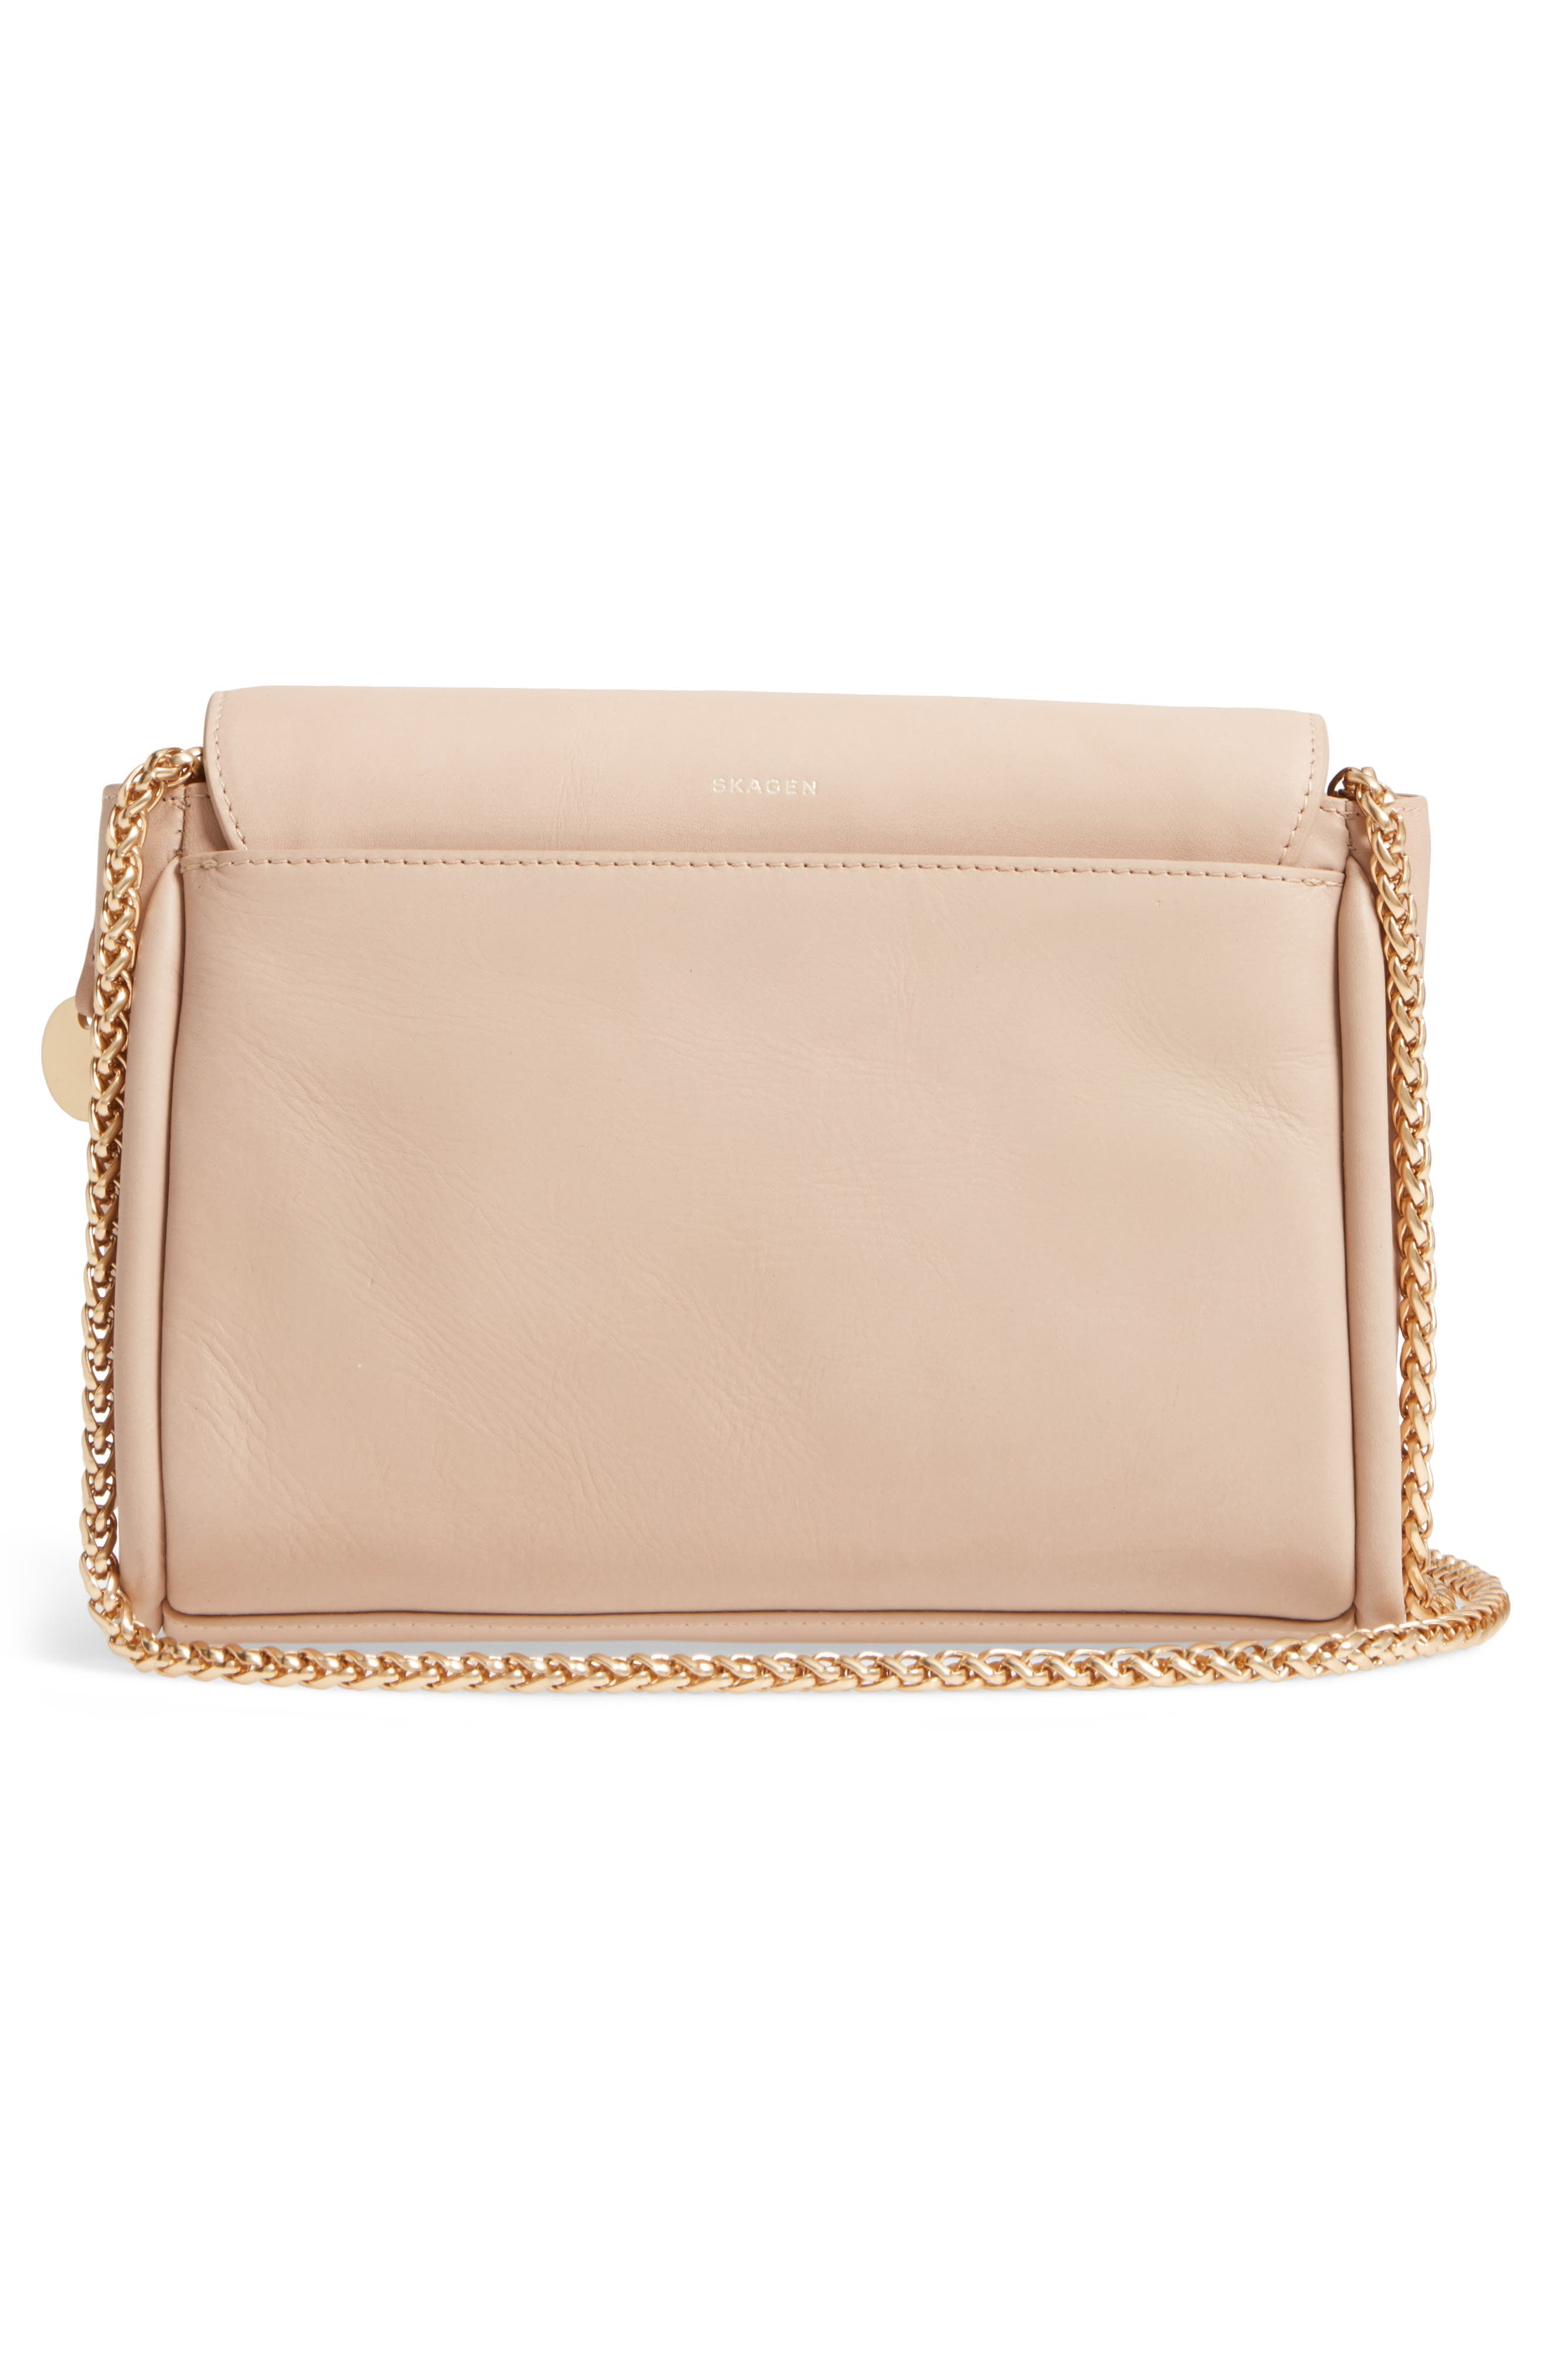 Sylvi Calfskin Leather Crossbody Bag,                             Alternate thumbnail 3, color,                             251